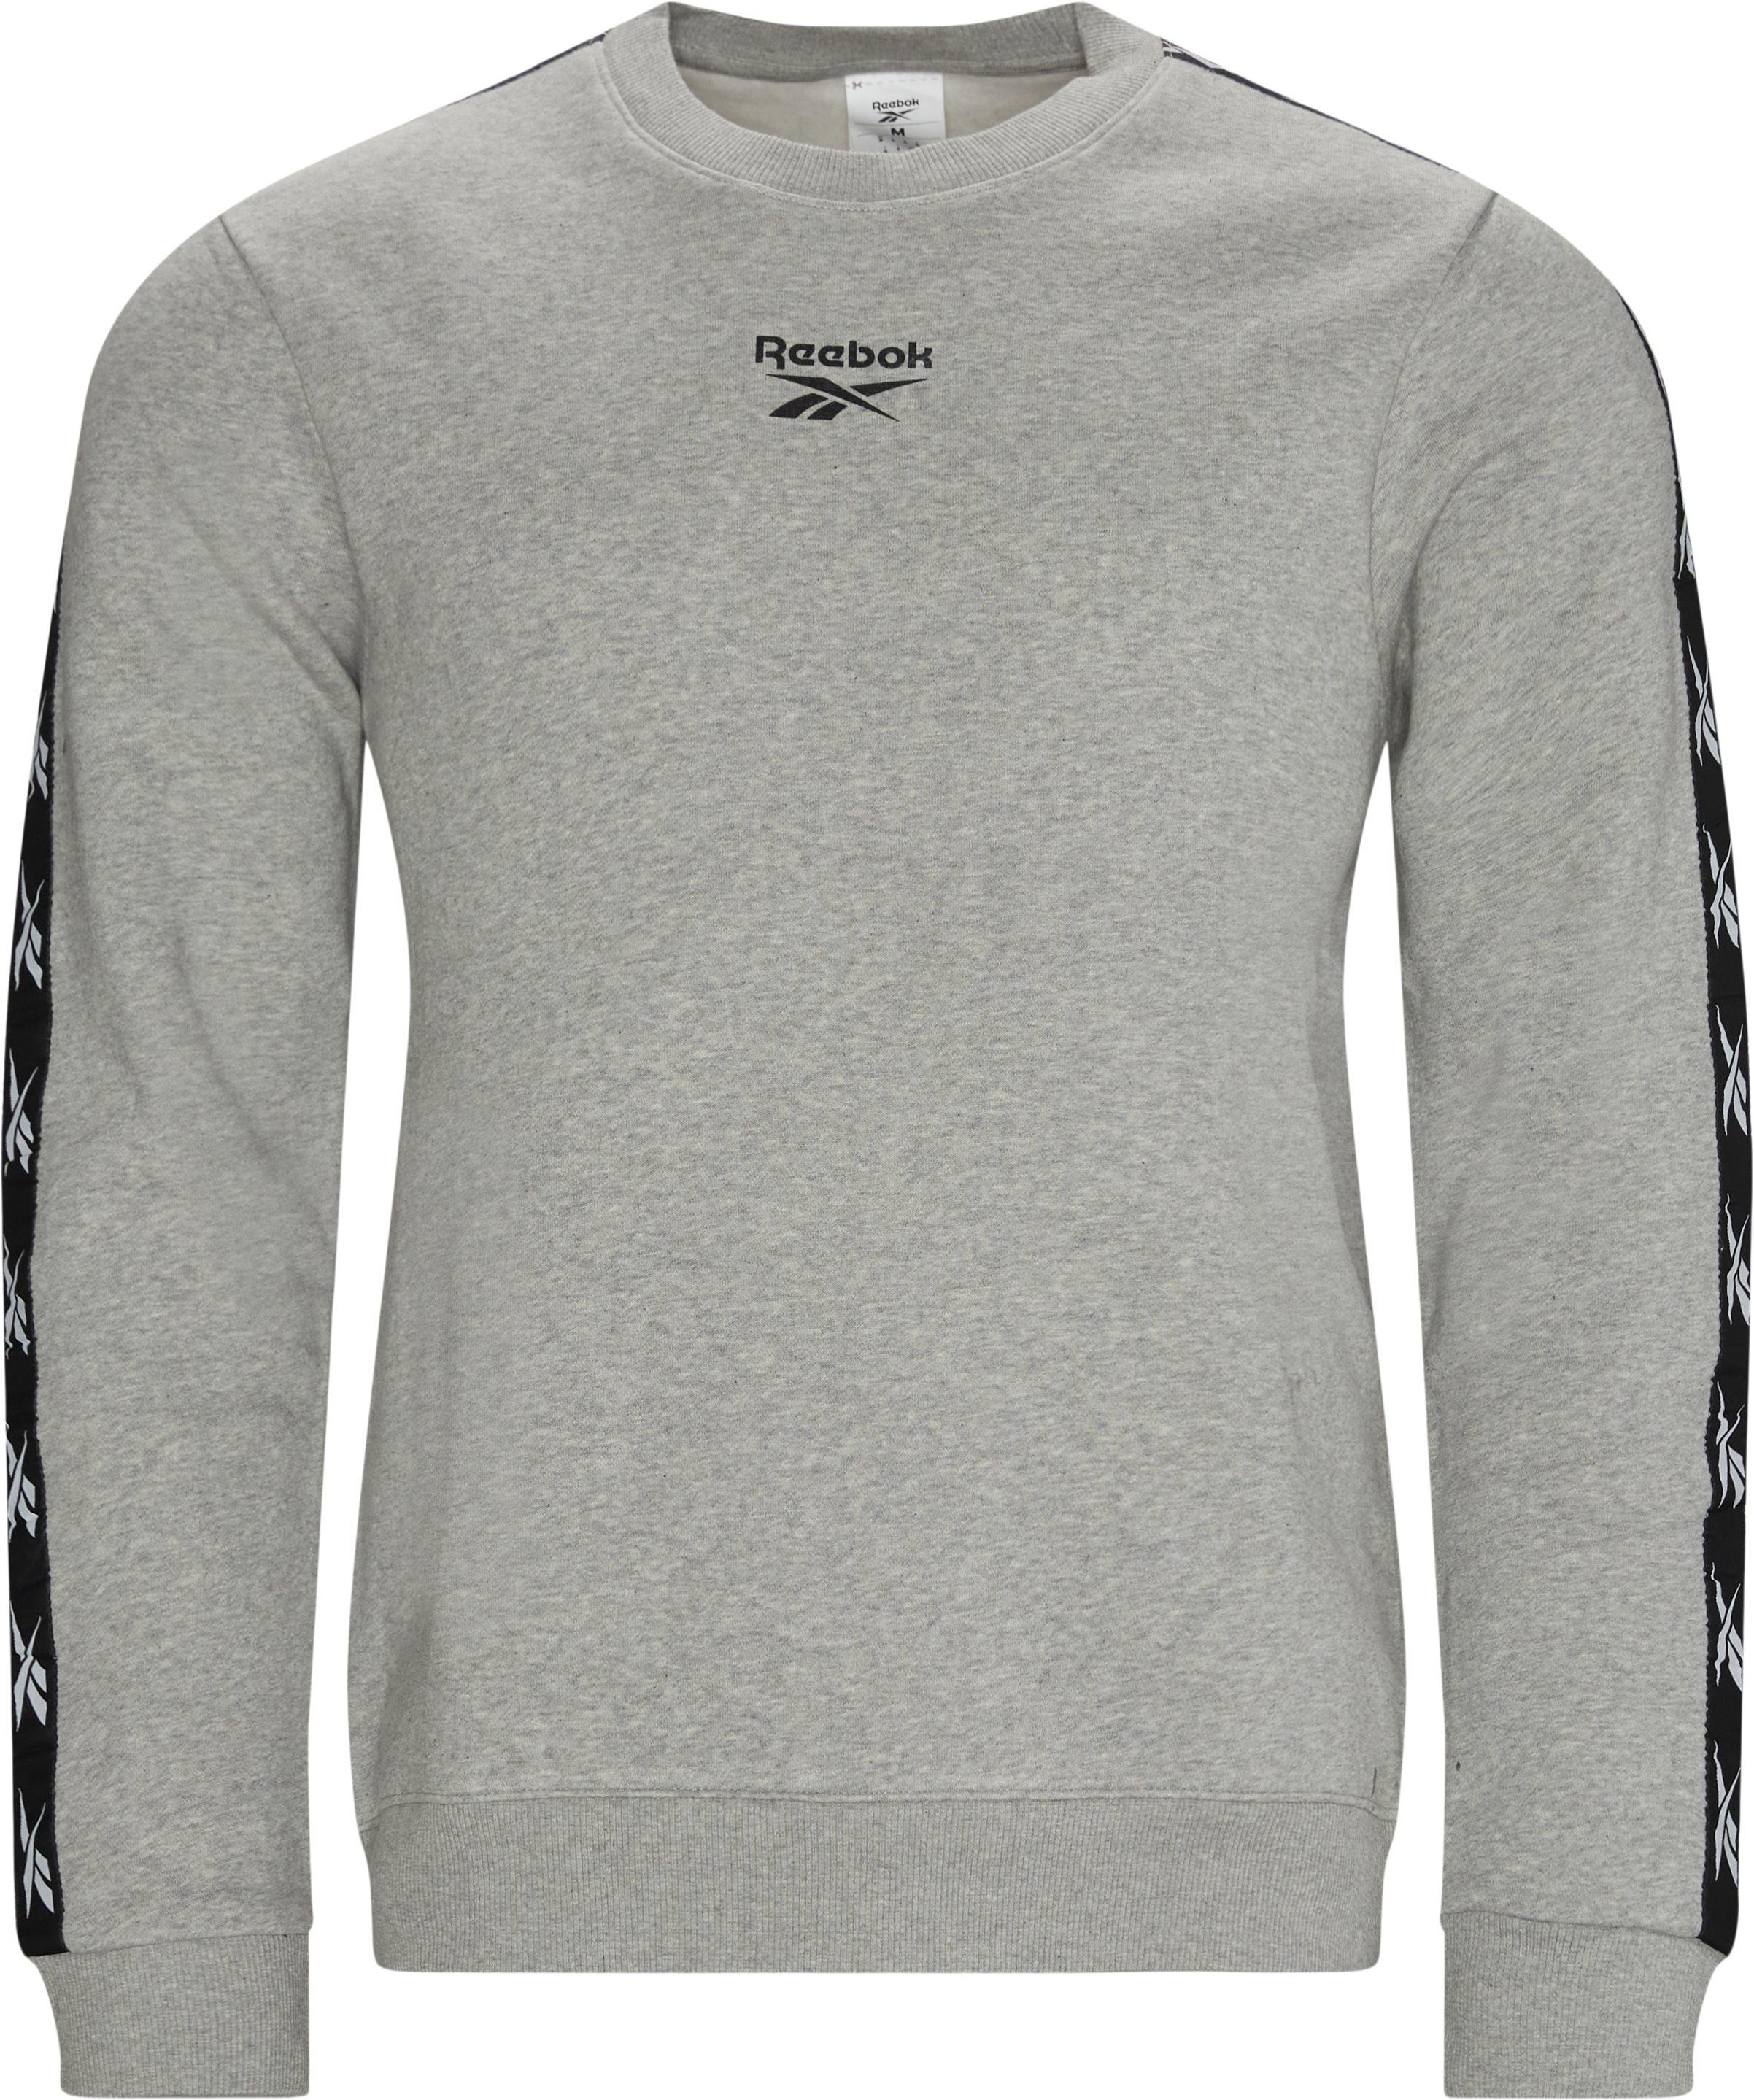 Te Tape Crewneck - Sweatshirts - Regular - Grå